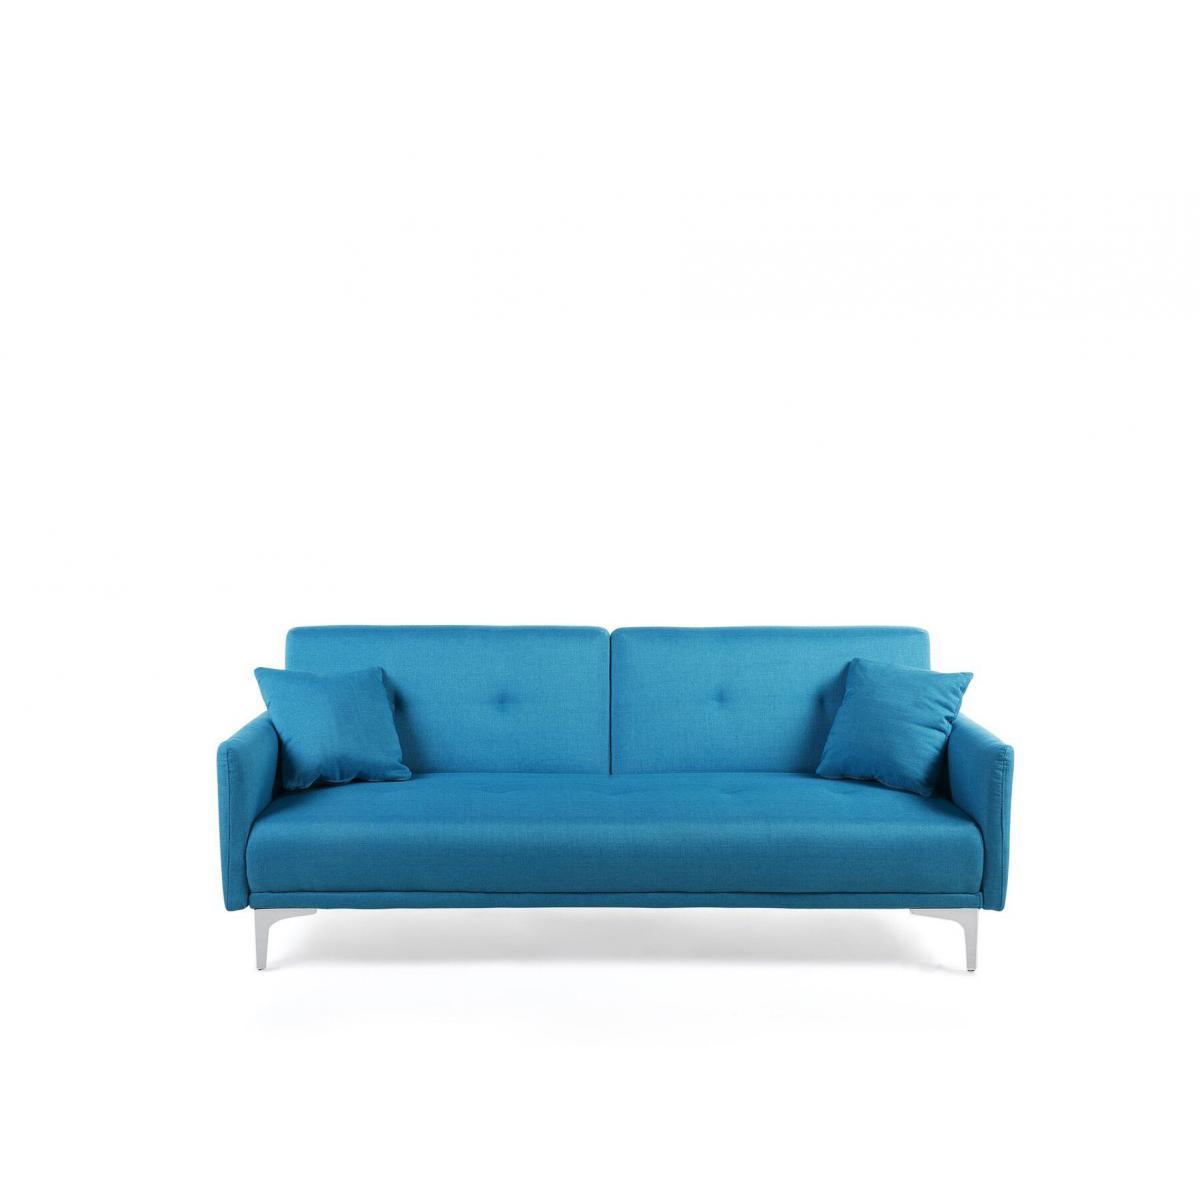 Beliani Canapé convertible 3 places en tissu bleu LUCAN - bleu marine